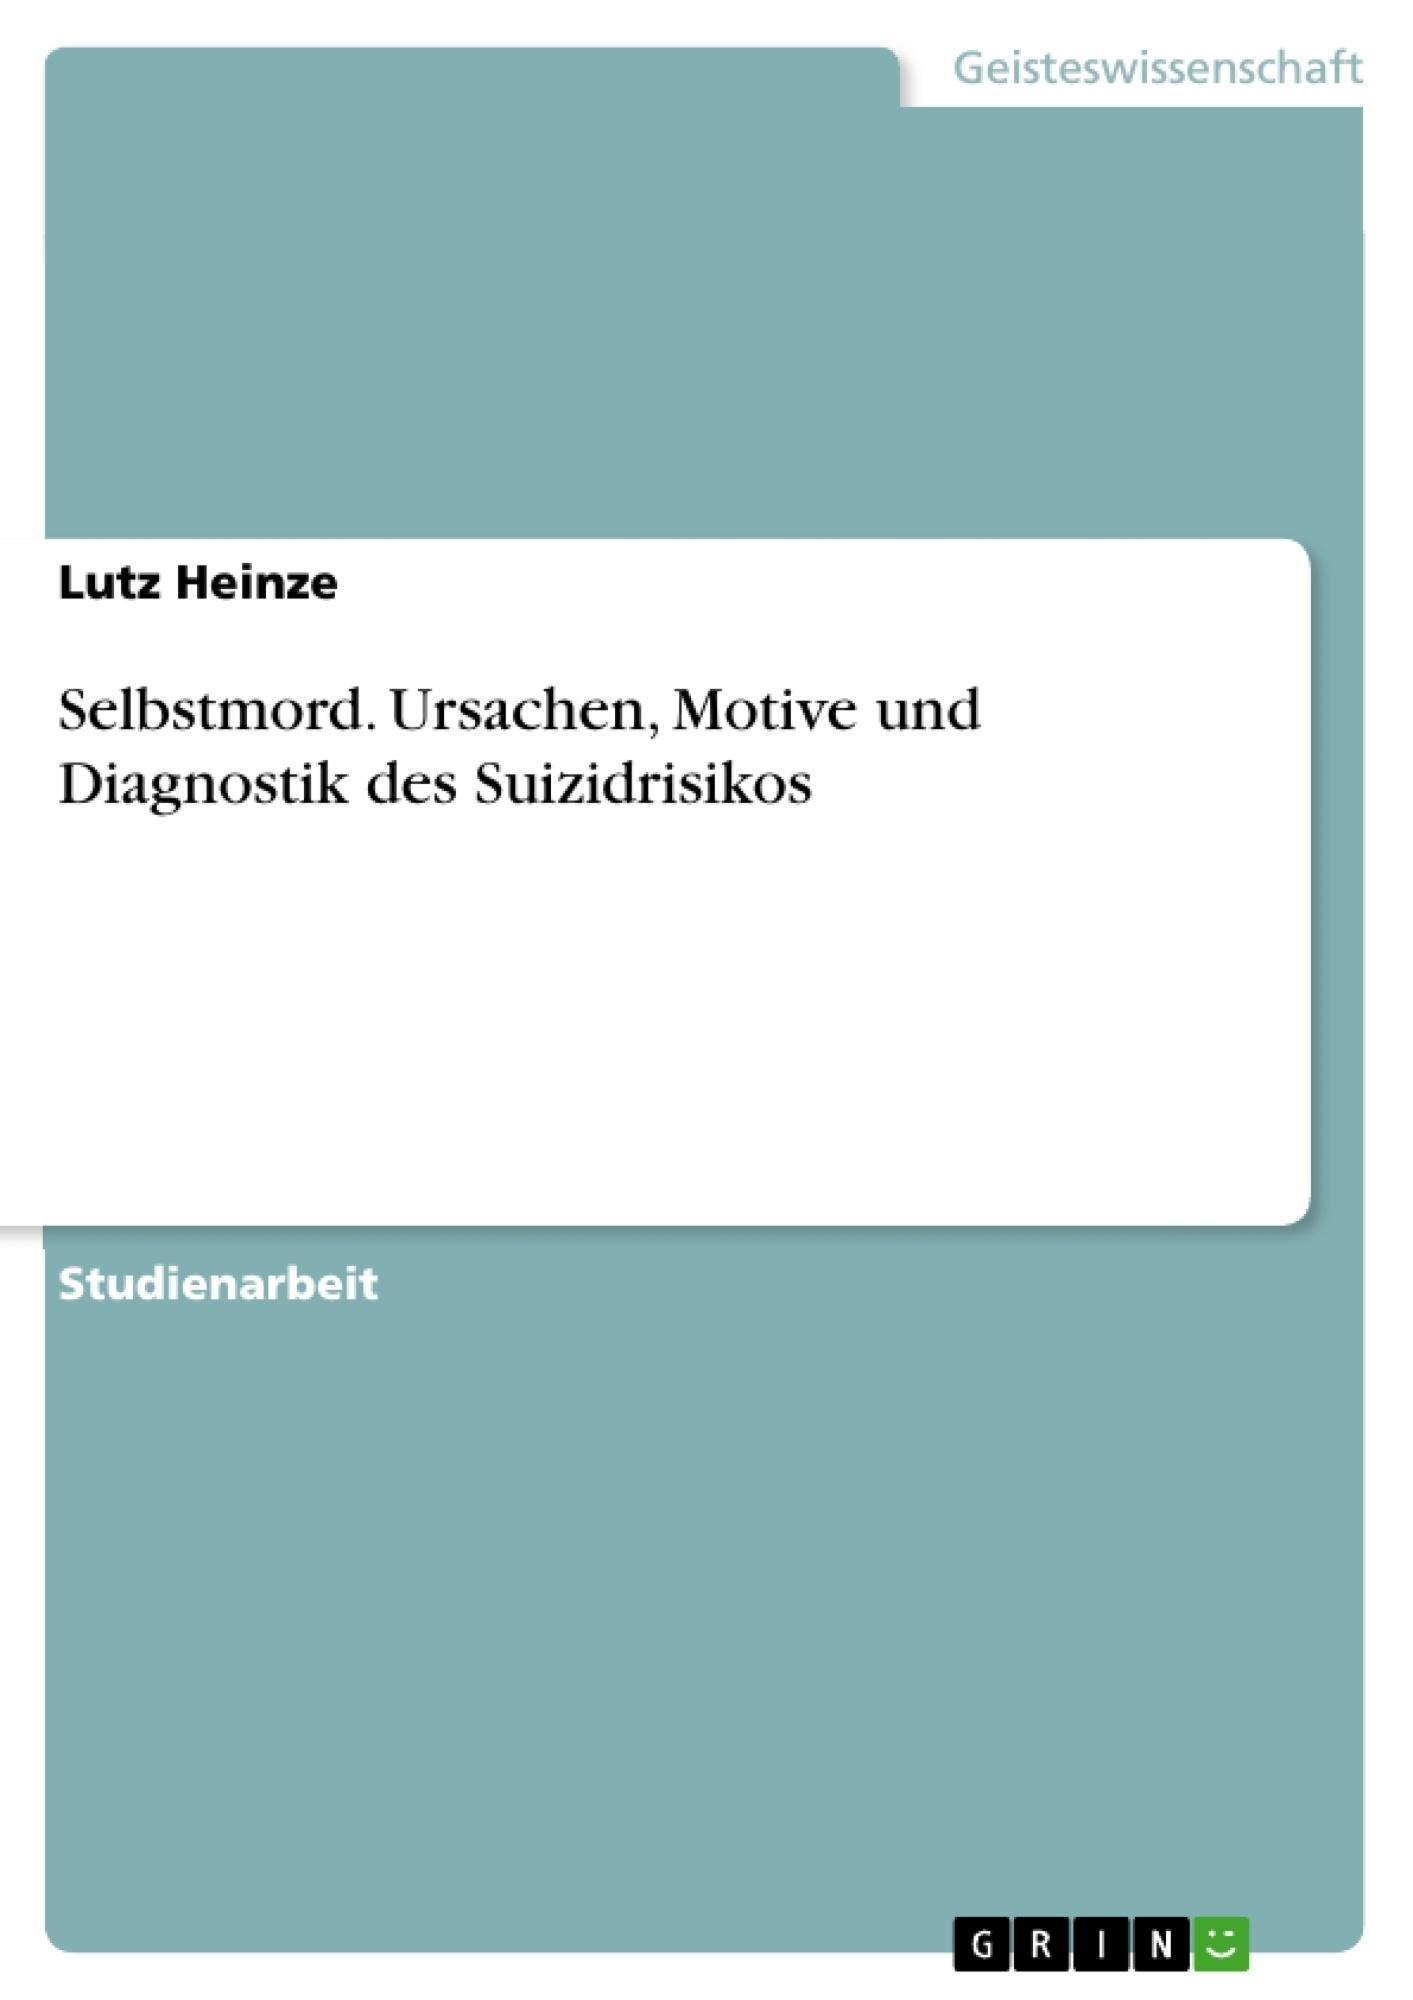 Titel: Selbstmord. Ursachen, Motive und Diagnostik des Suizidrisikos